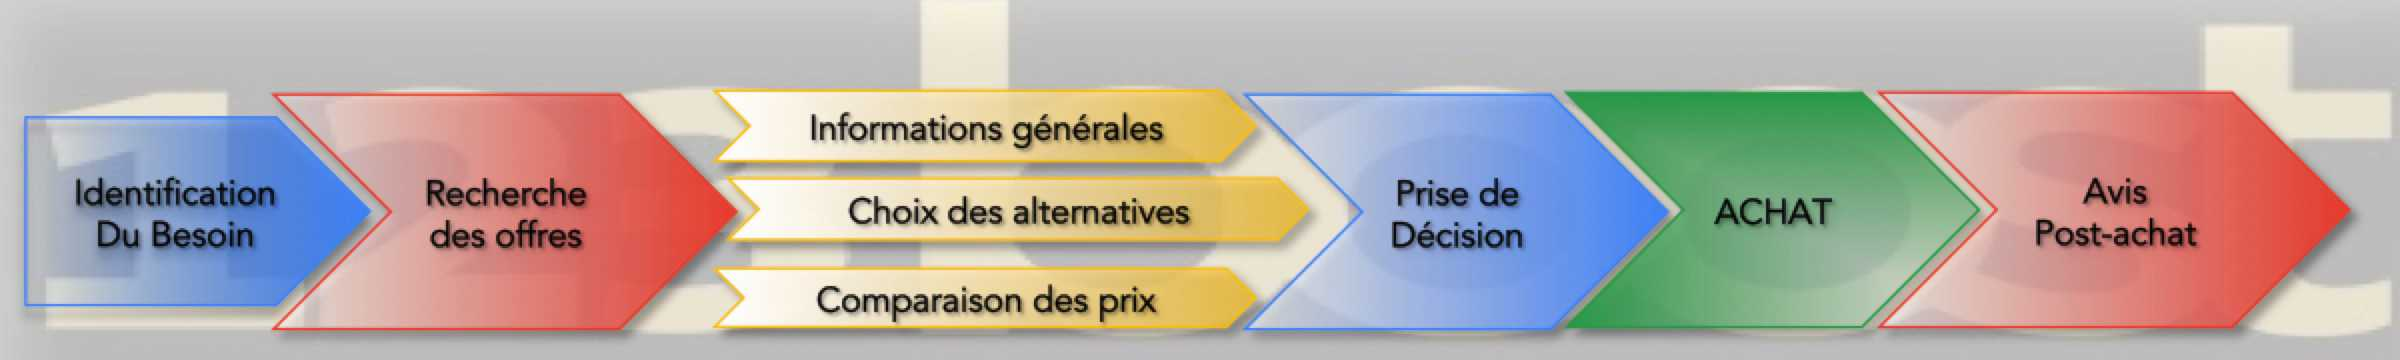 chemin_habituel_pptx 2